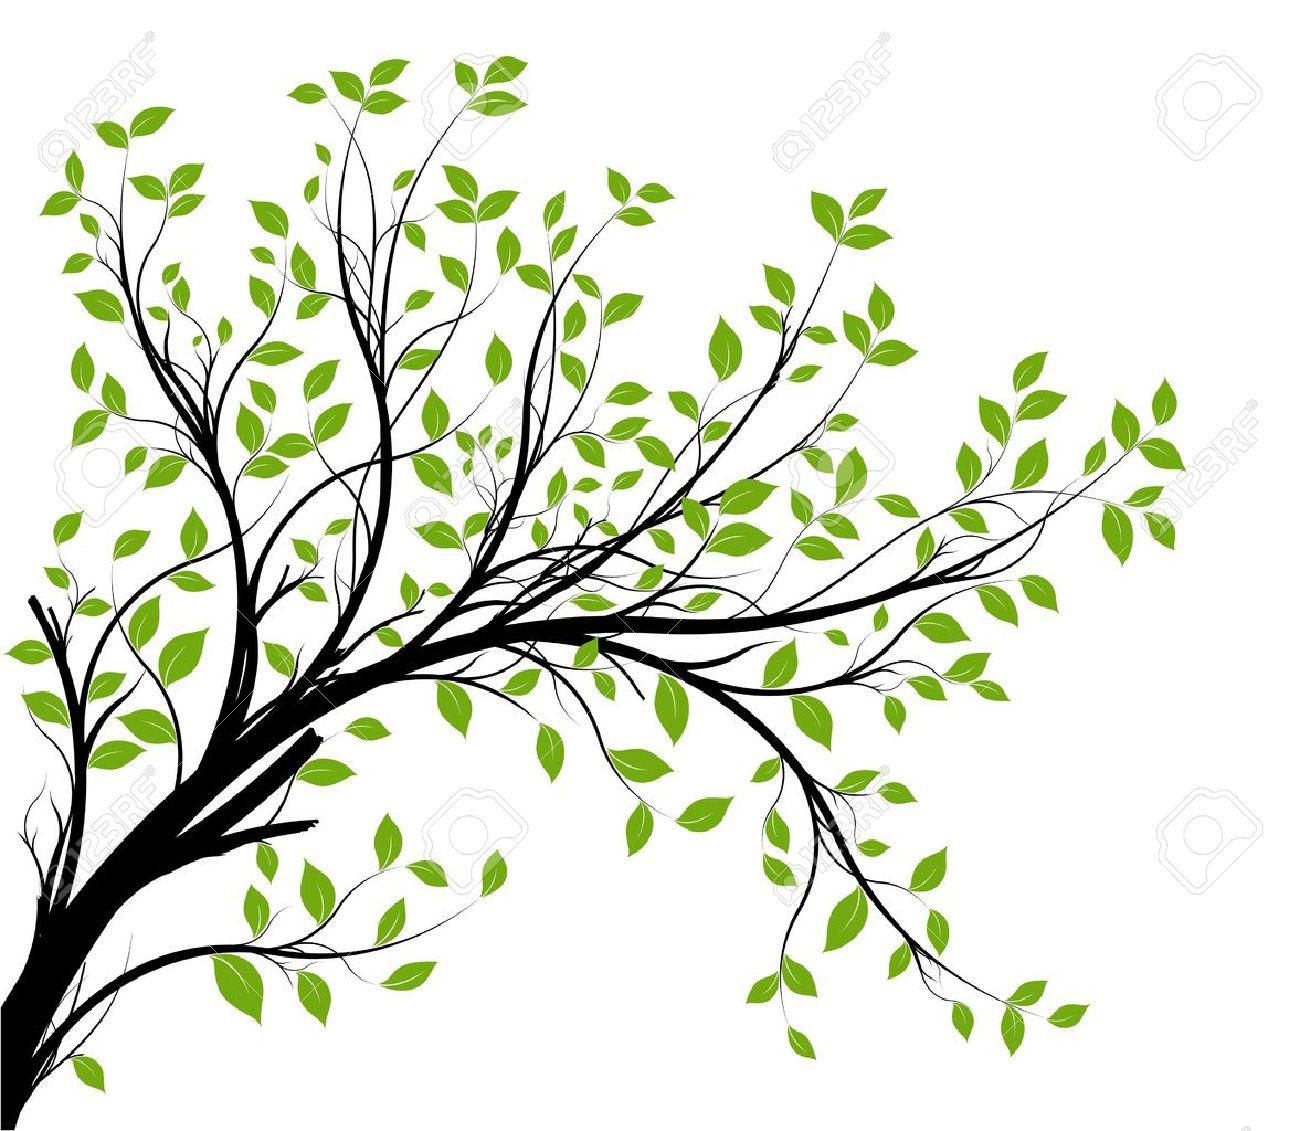 Branch Silhouette